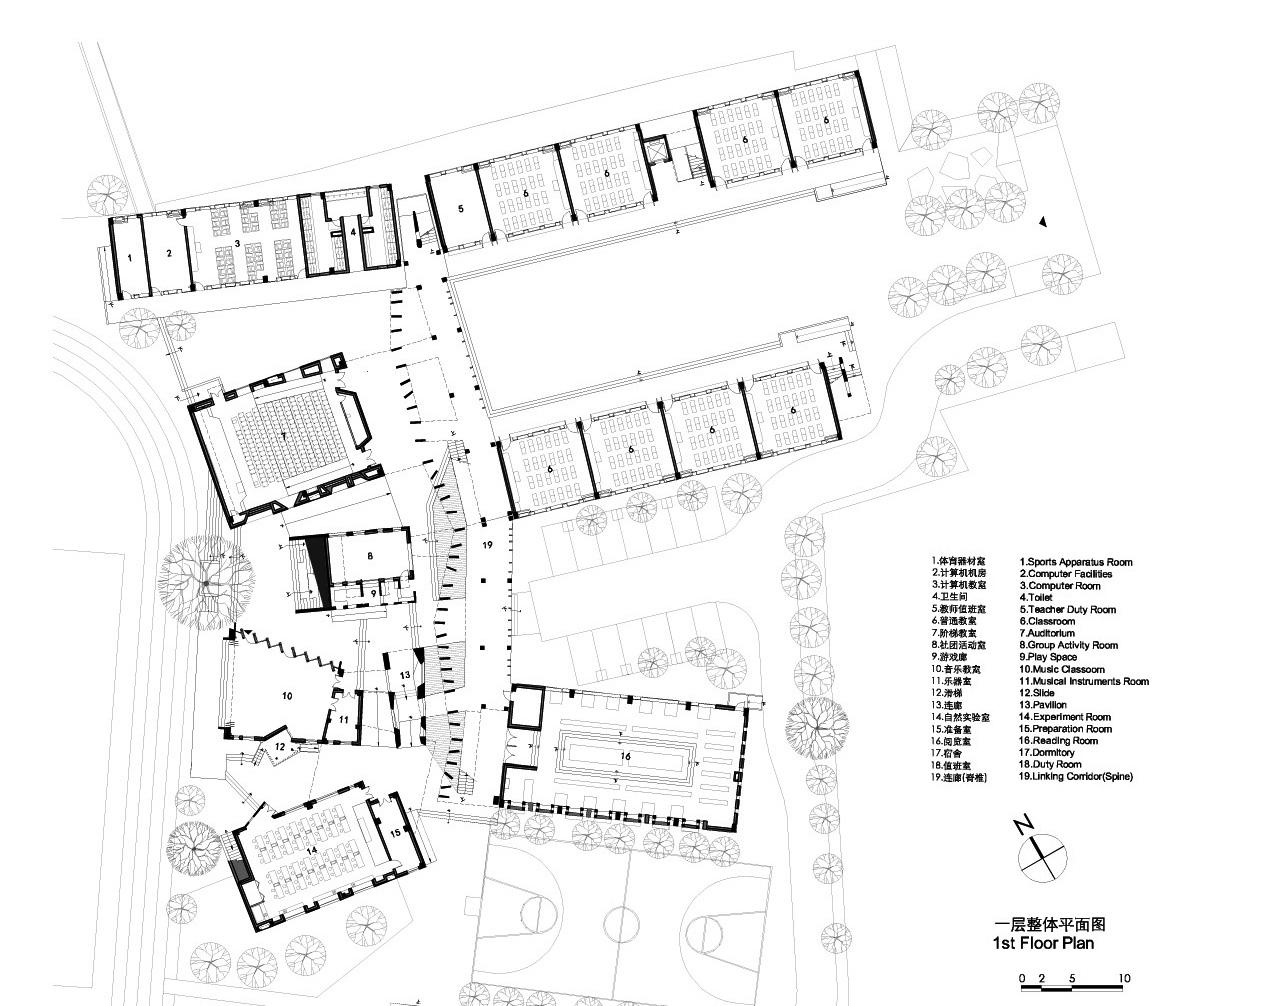 Architecture School Plan gallery of xiaoquan elementary school / tao - trace architecture